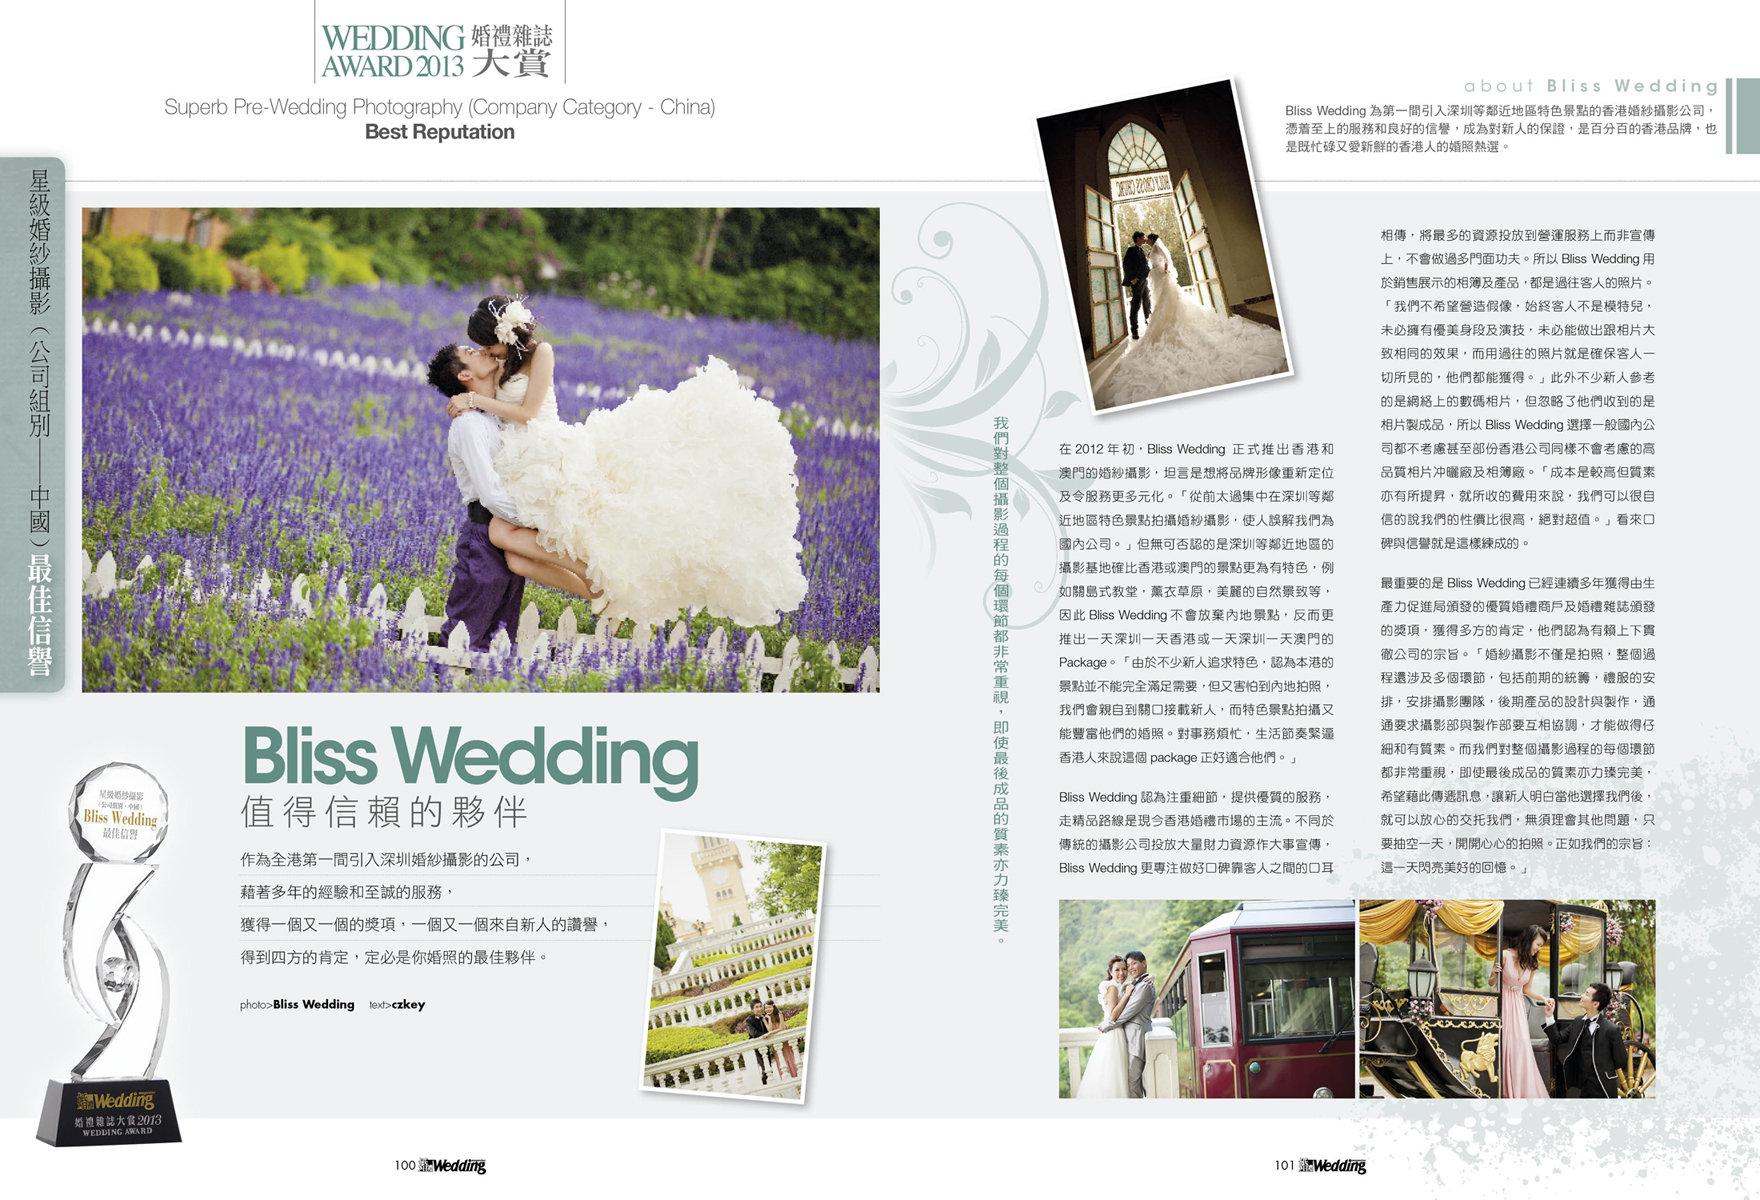 Bliss Wedding 以專業婚紗攝影態度,時尚婚紗攝影風格,吸引婚紗攝影價錢,讓你享受不一樣的婚紗攝影服務。